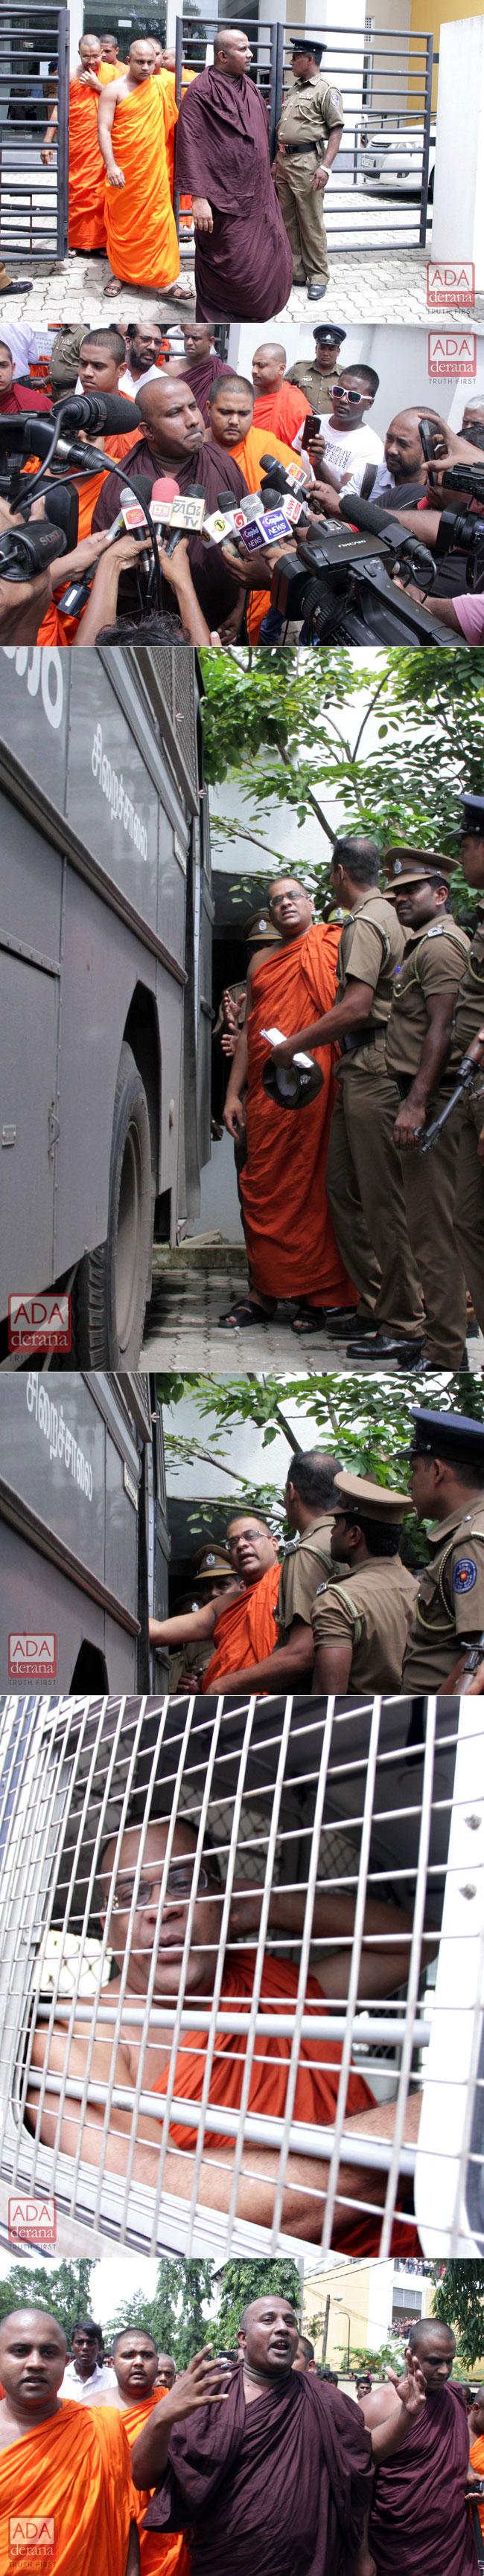 Gnanasara Thero sentenced to 6 months RI